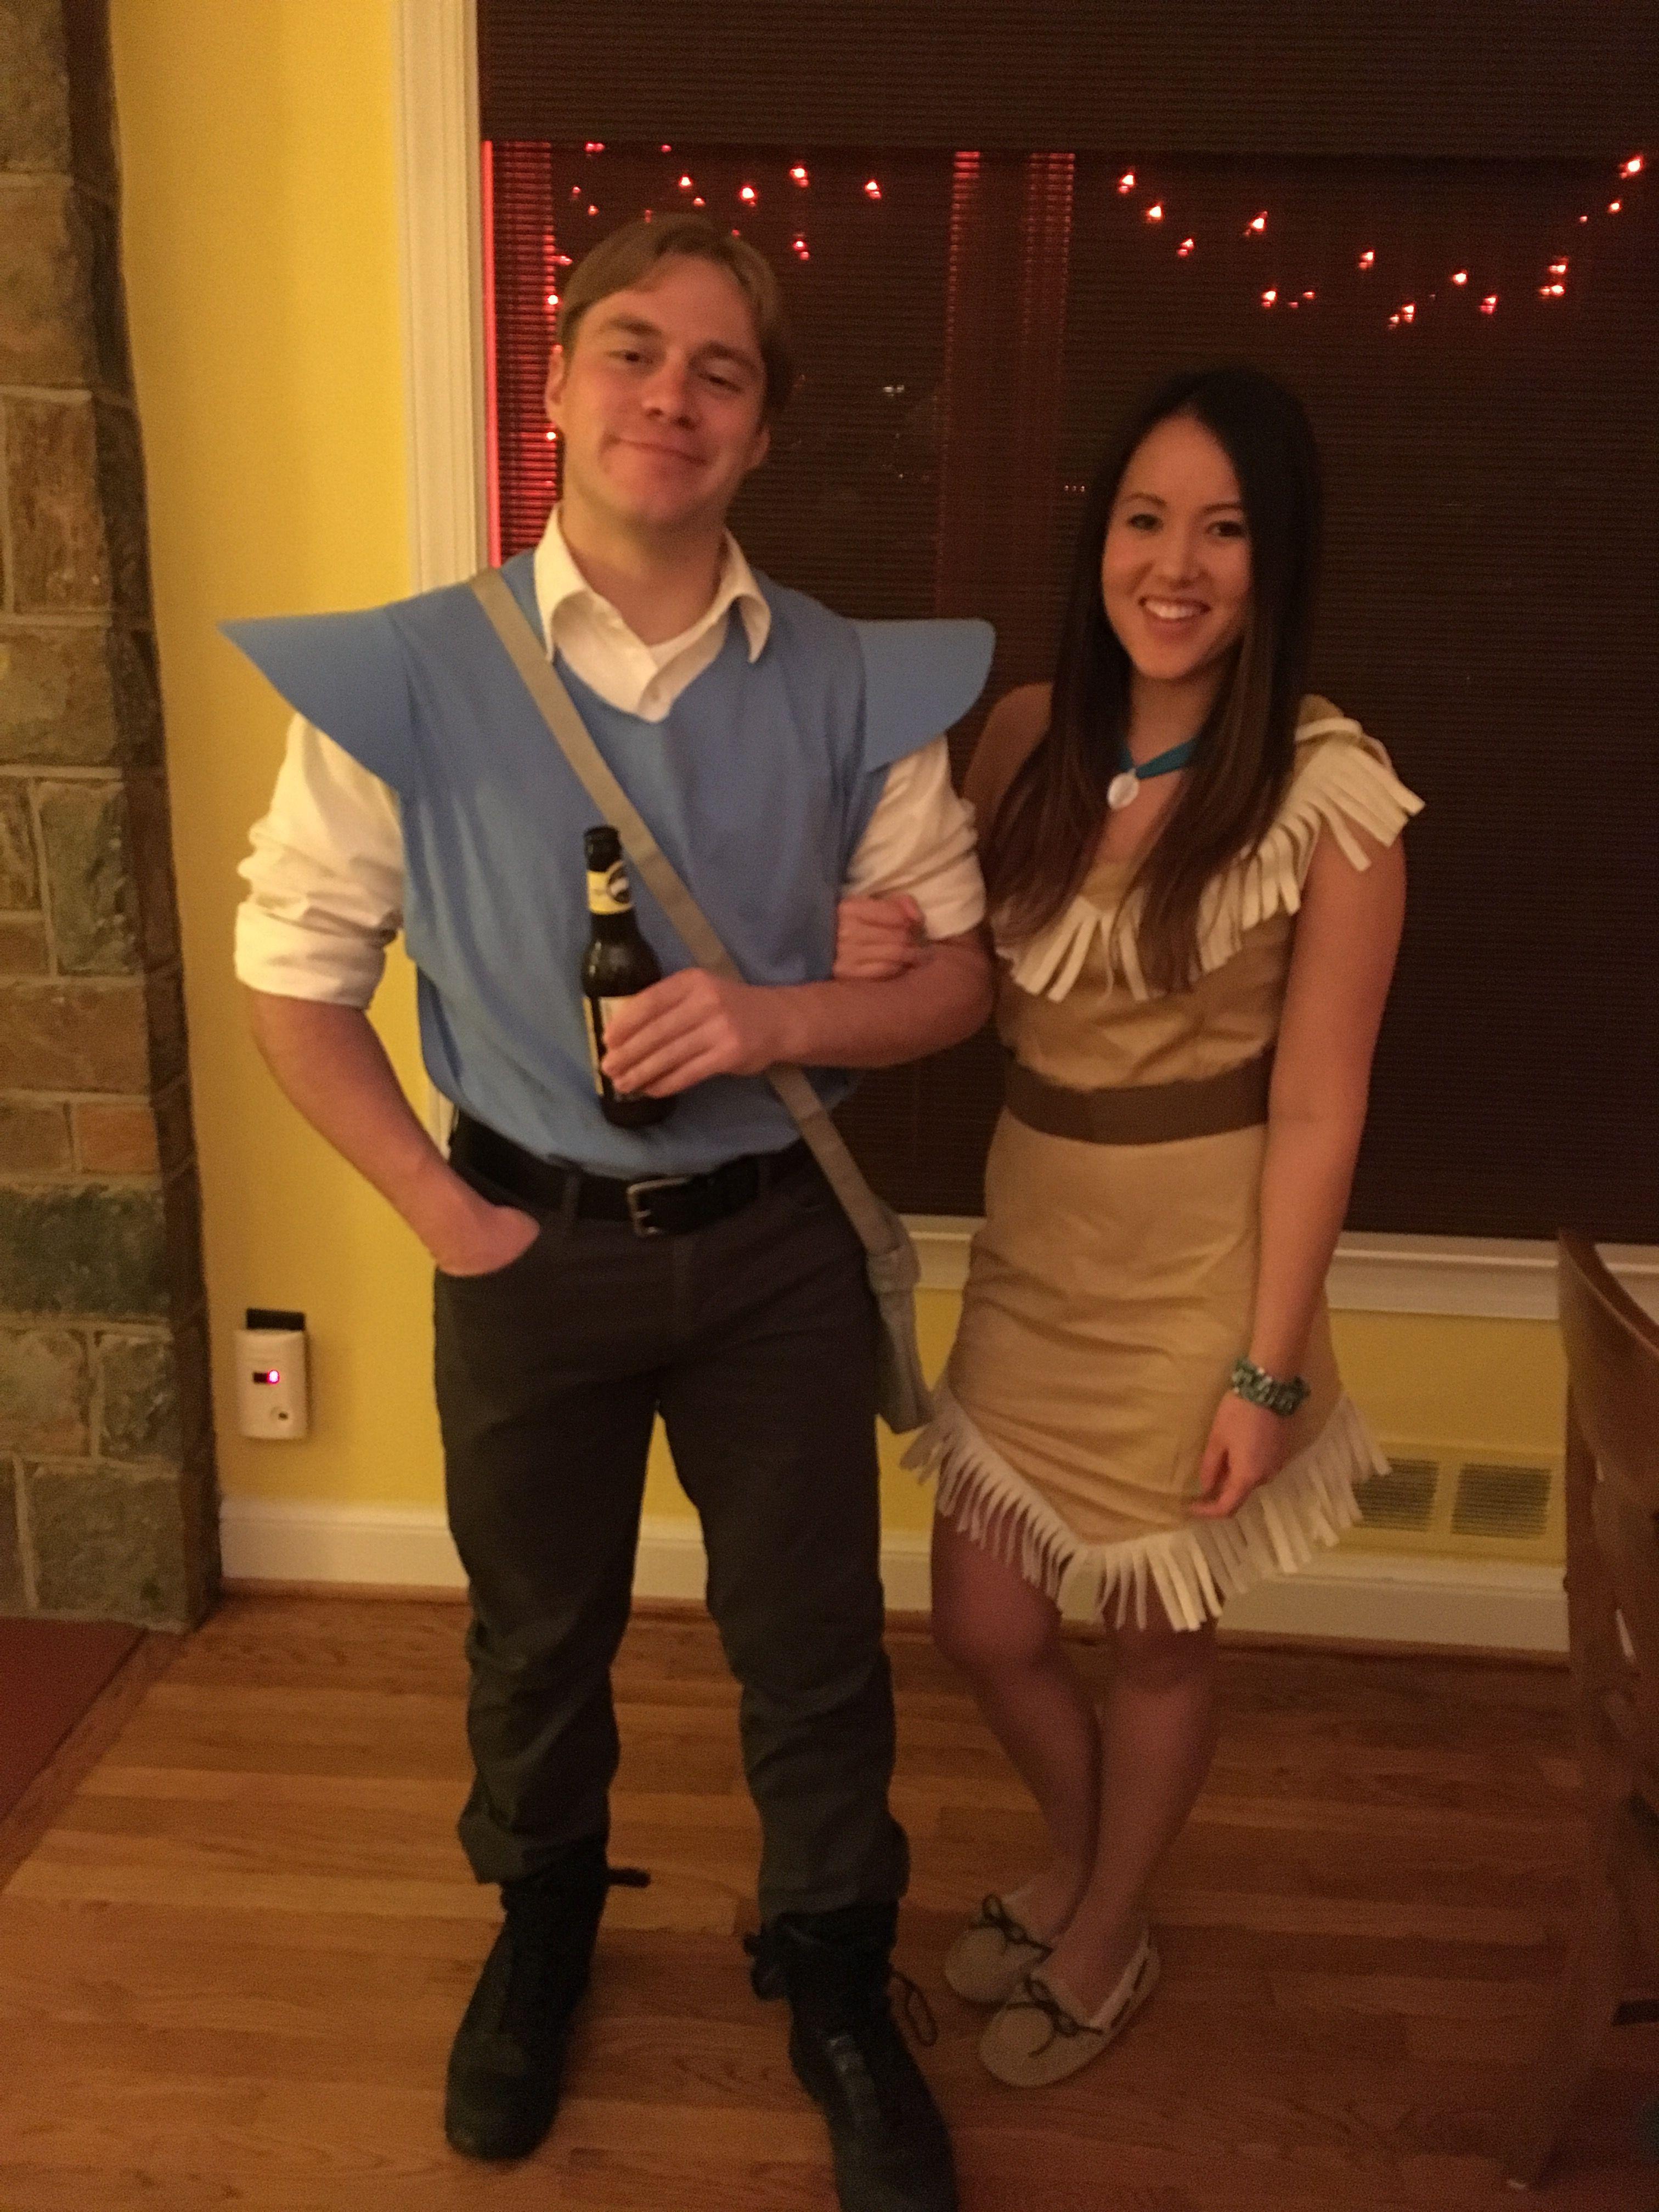 diy pocahontas john smith costume halloween couple ideas diy pocahontas johnsmith costume pocahontascostume diycostumes couplescostumes